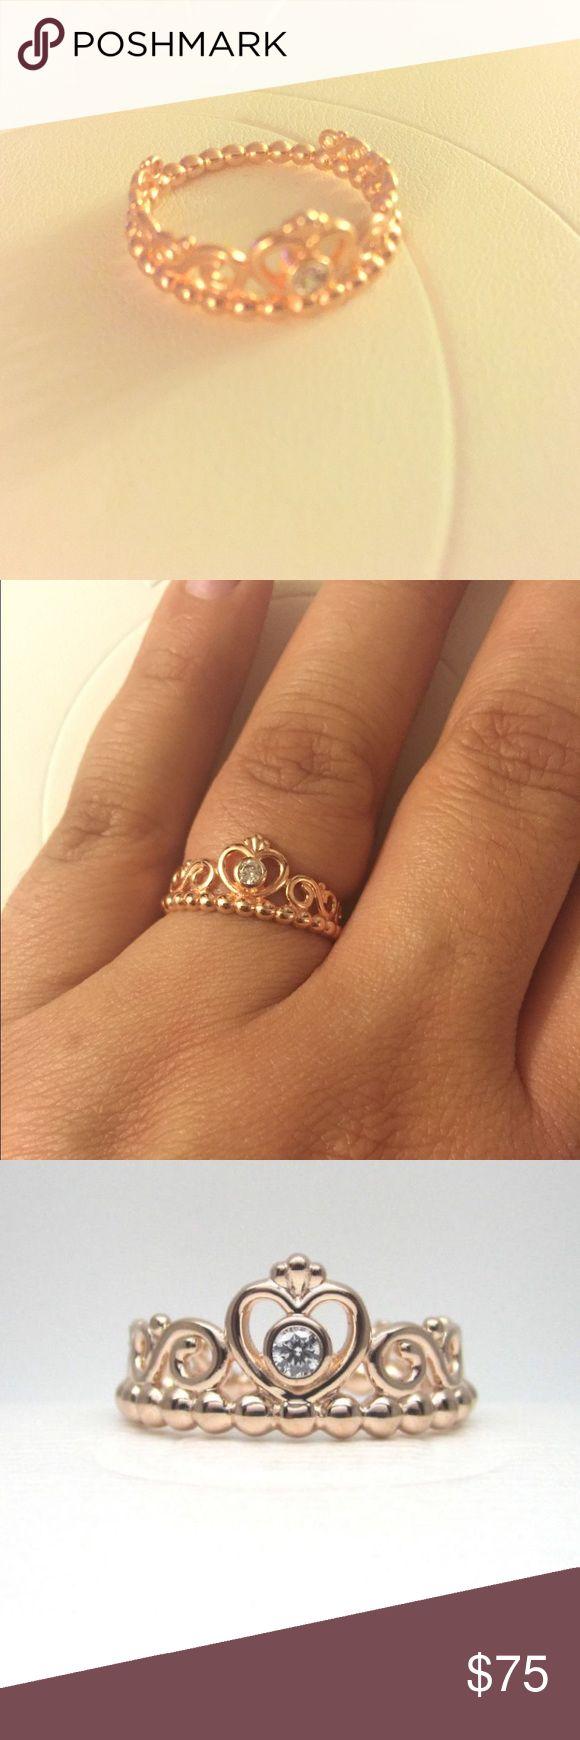 best fine jewelry u delicate arts images on pinterest